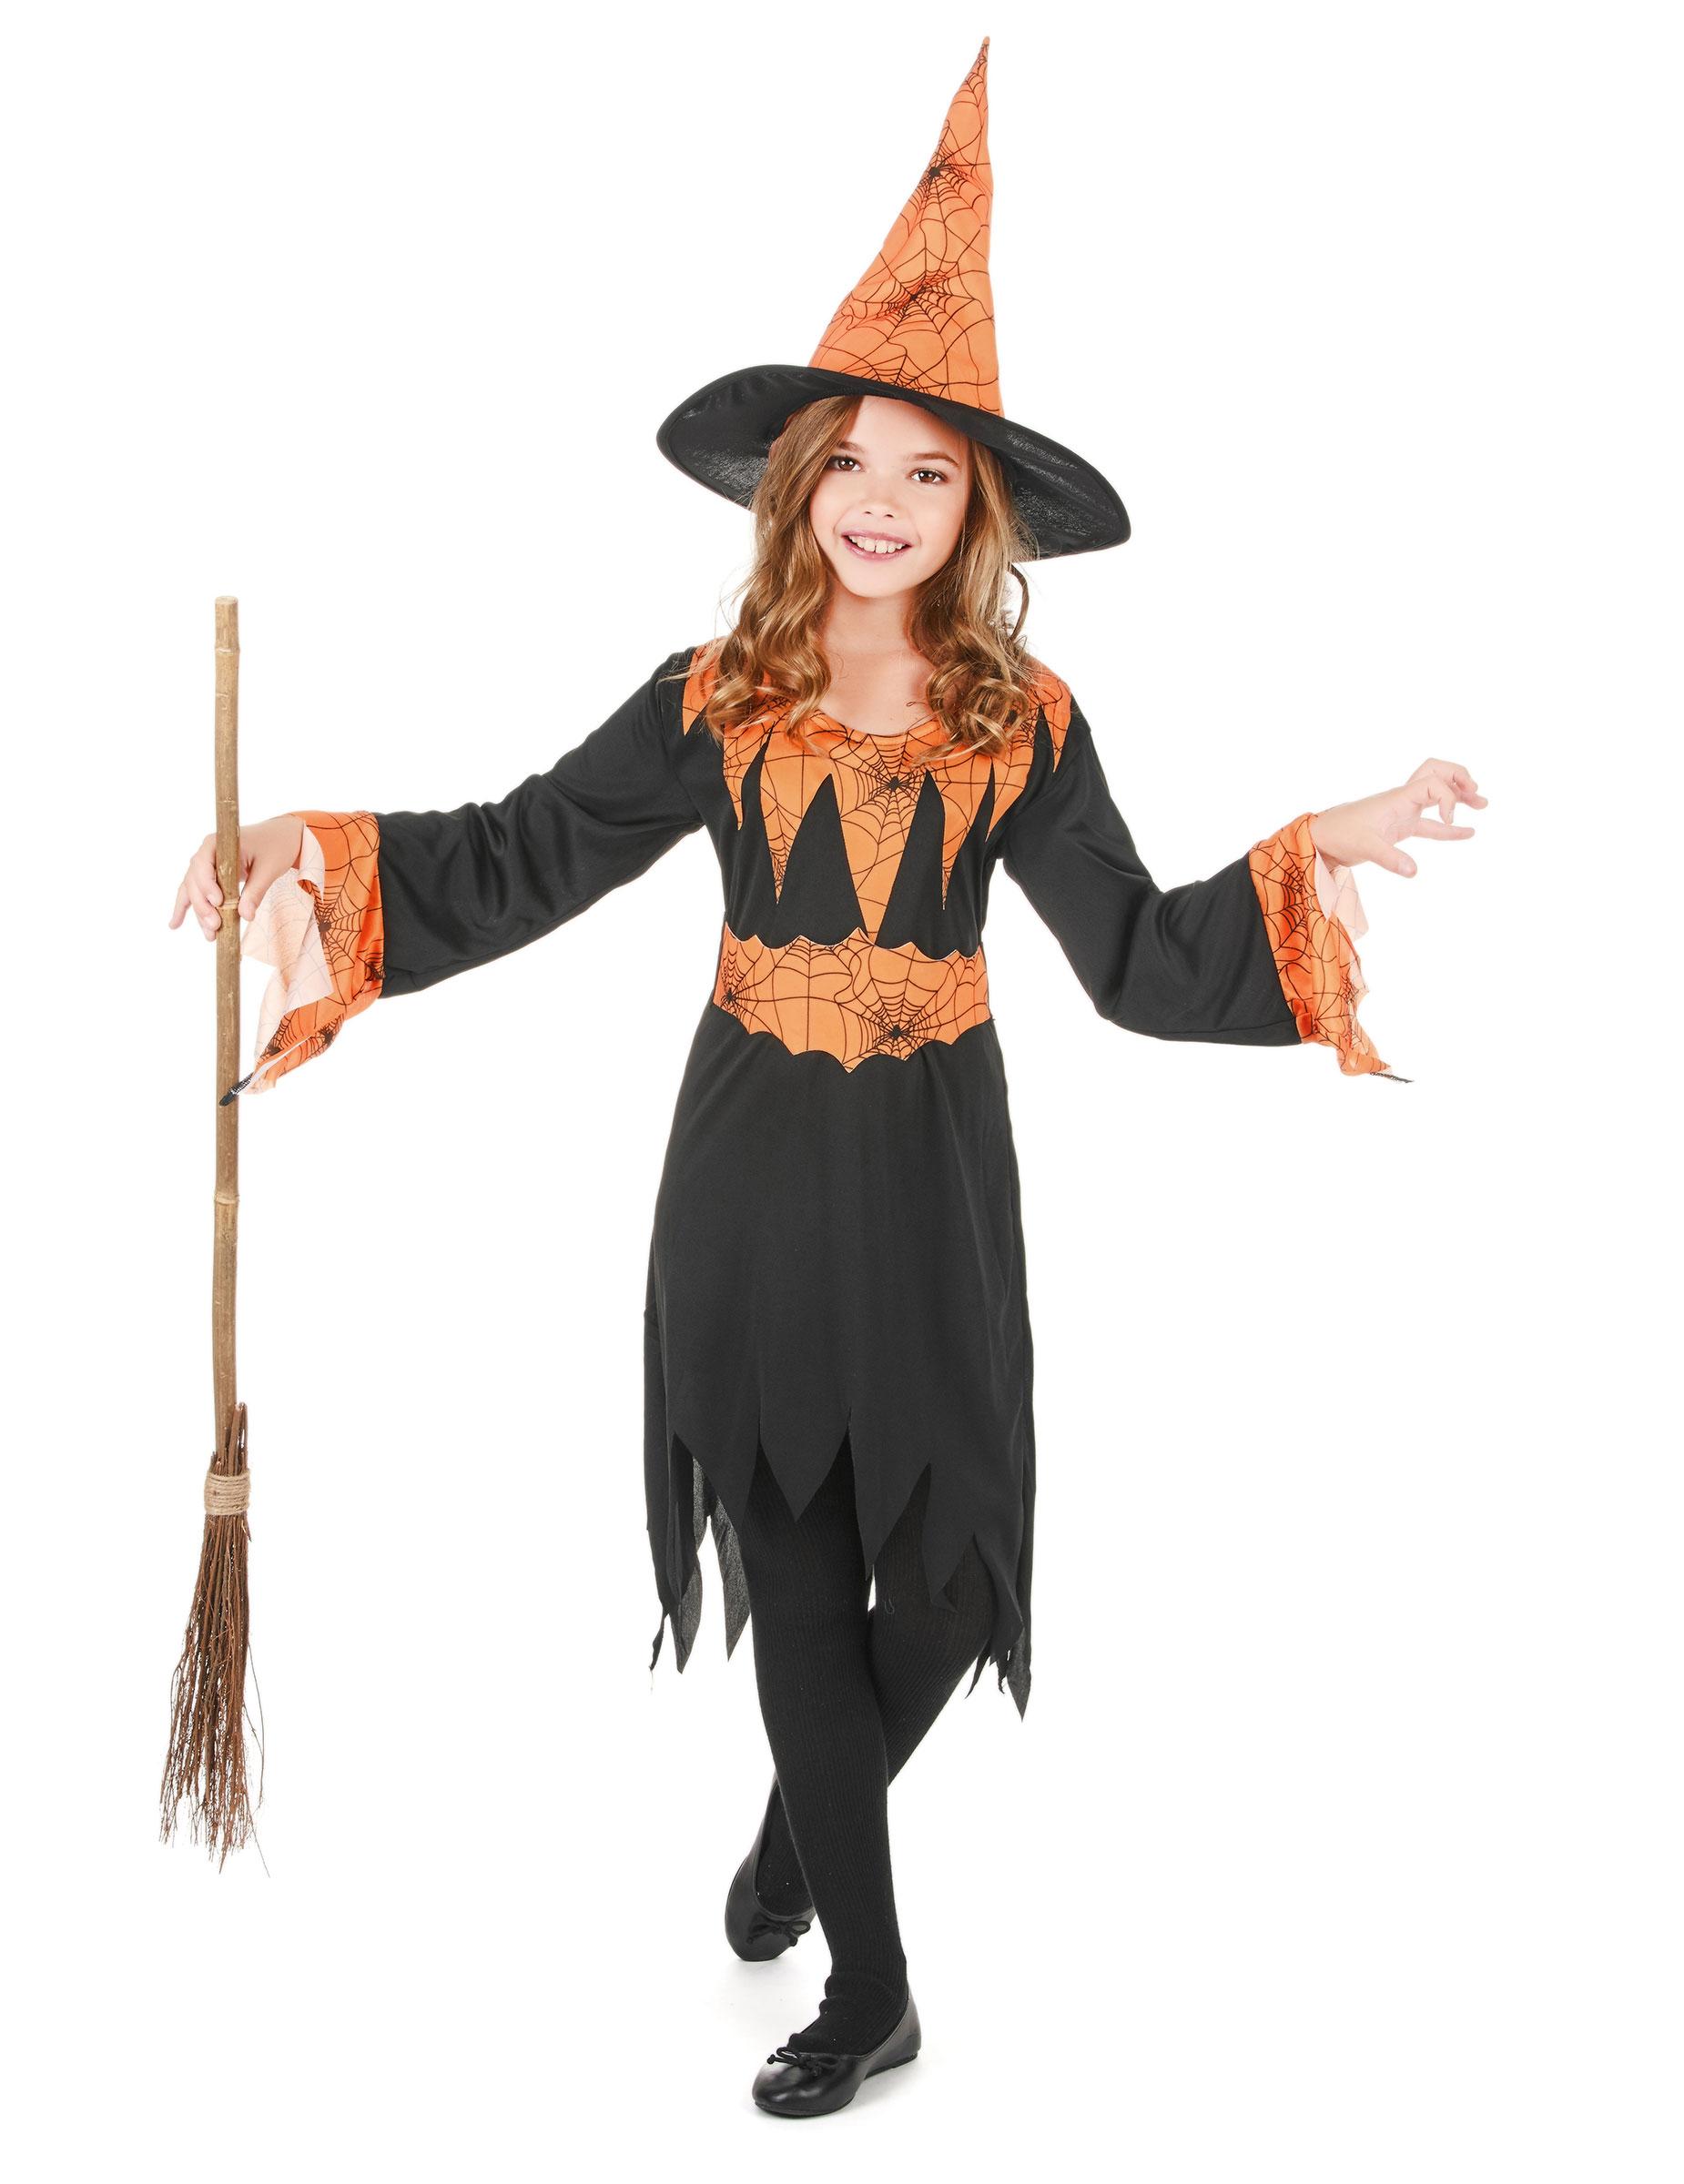 Costume da strega nero e arancione bambina Halloween acbfa1878d37